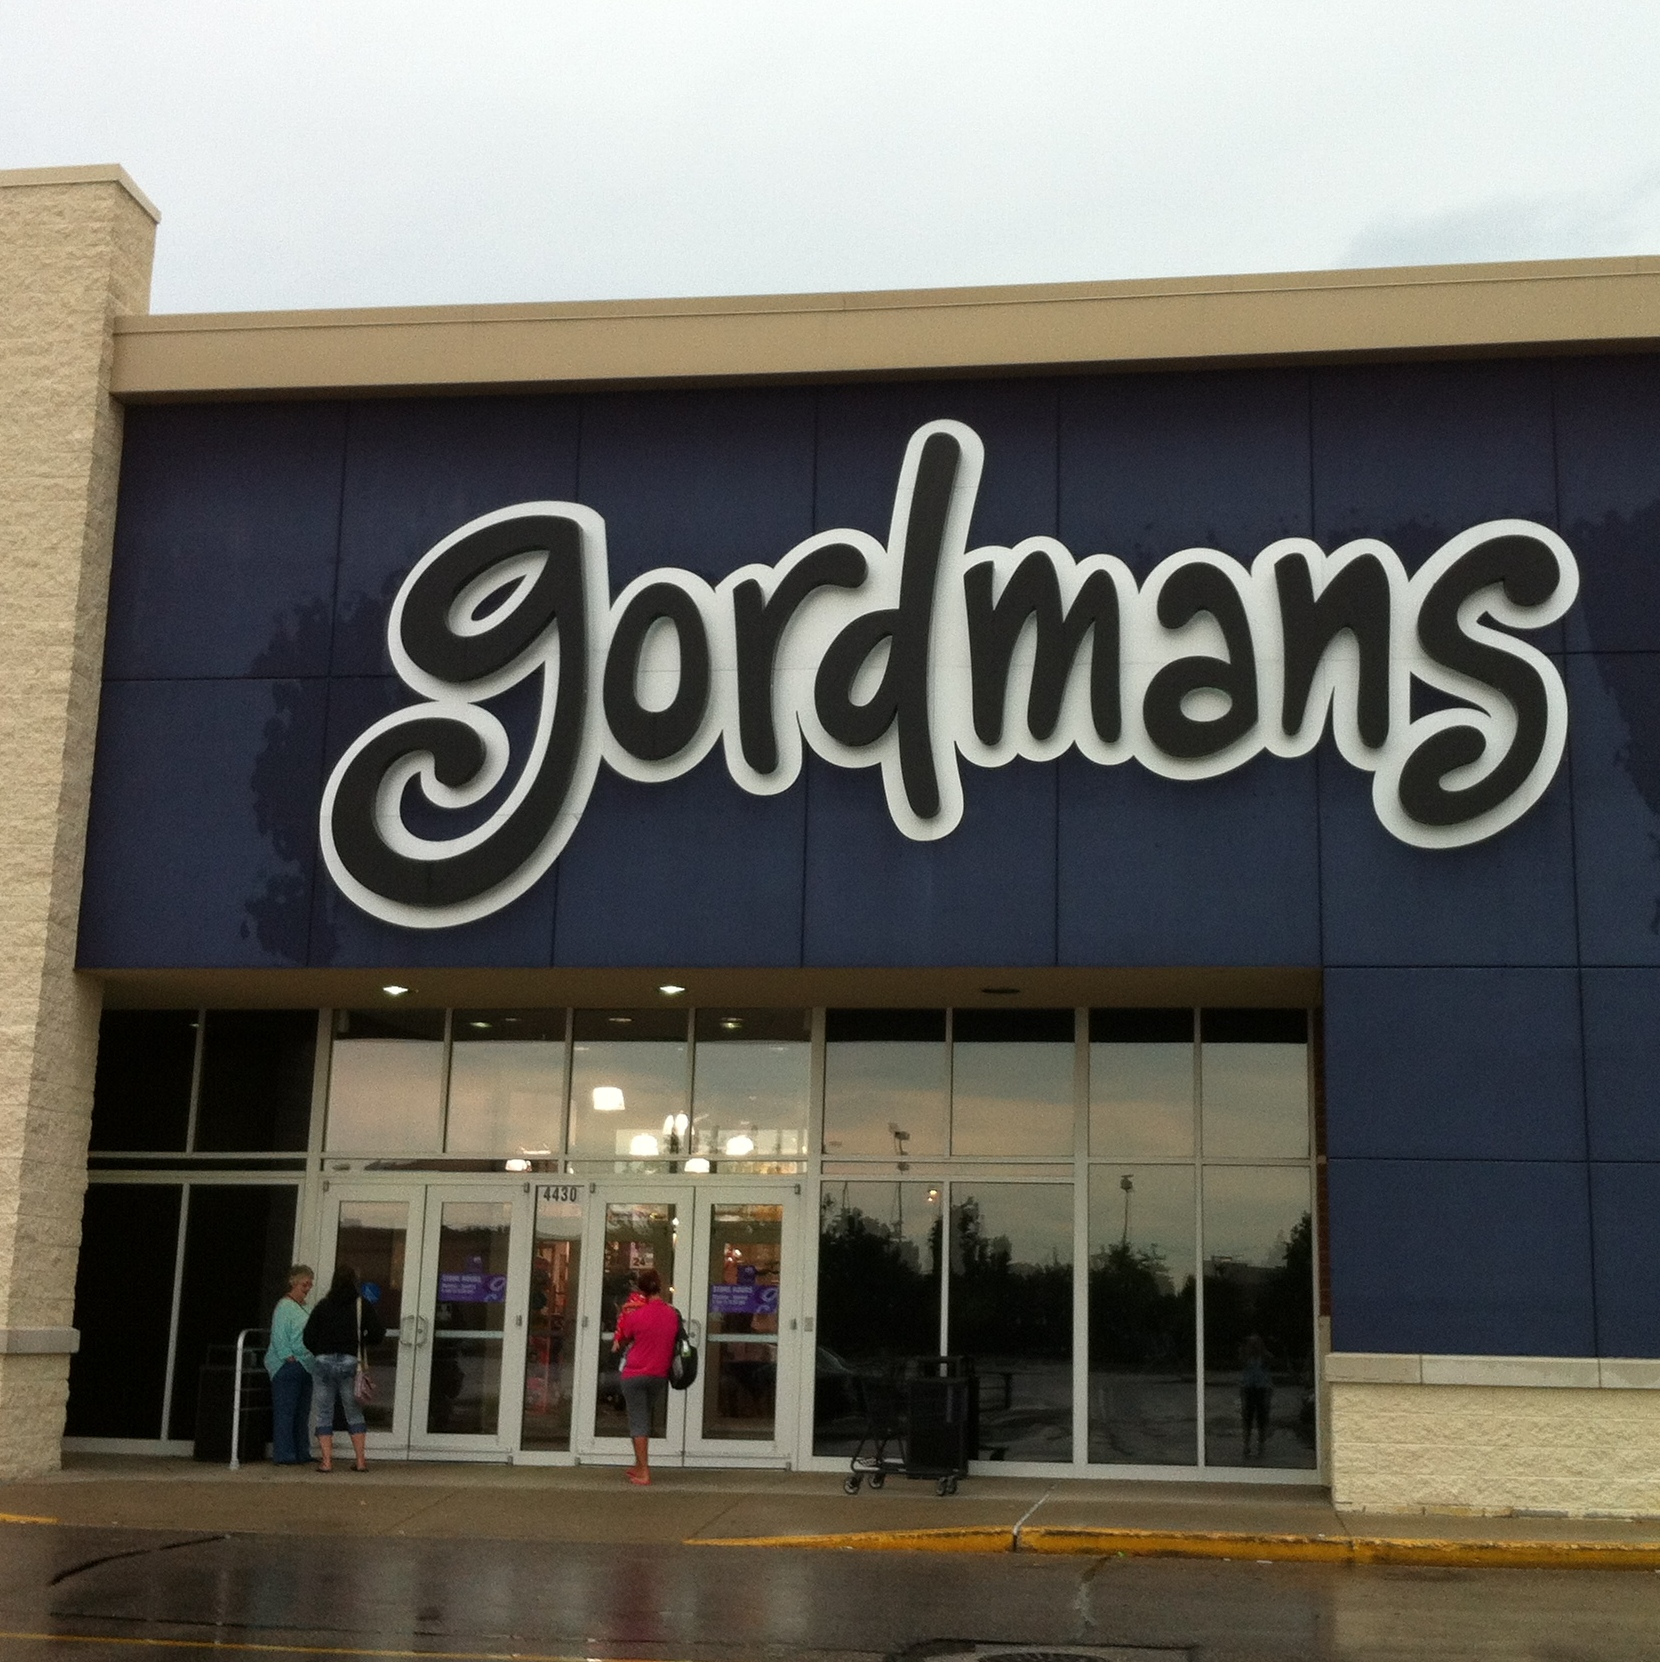 Gordmans clothing store